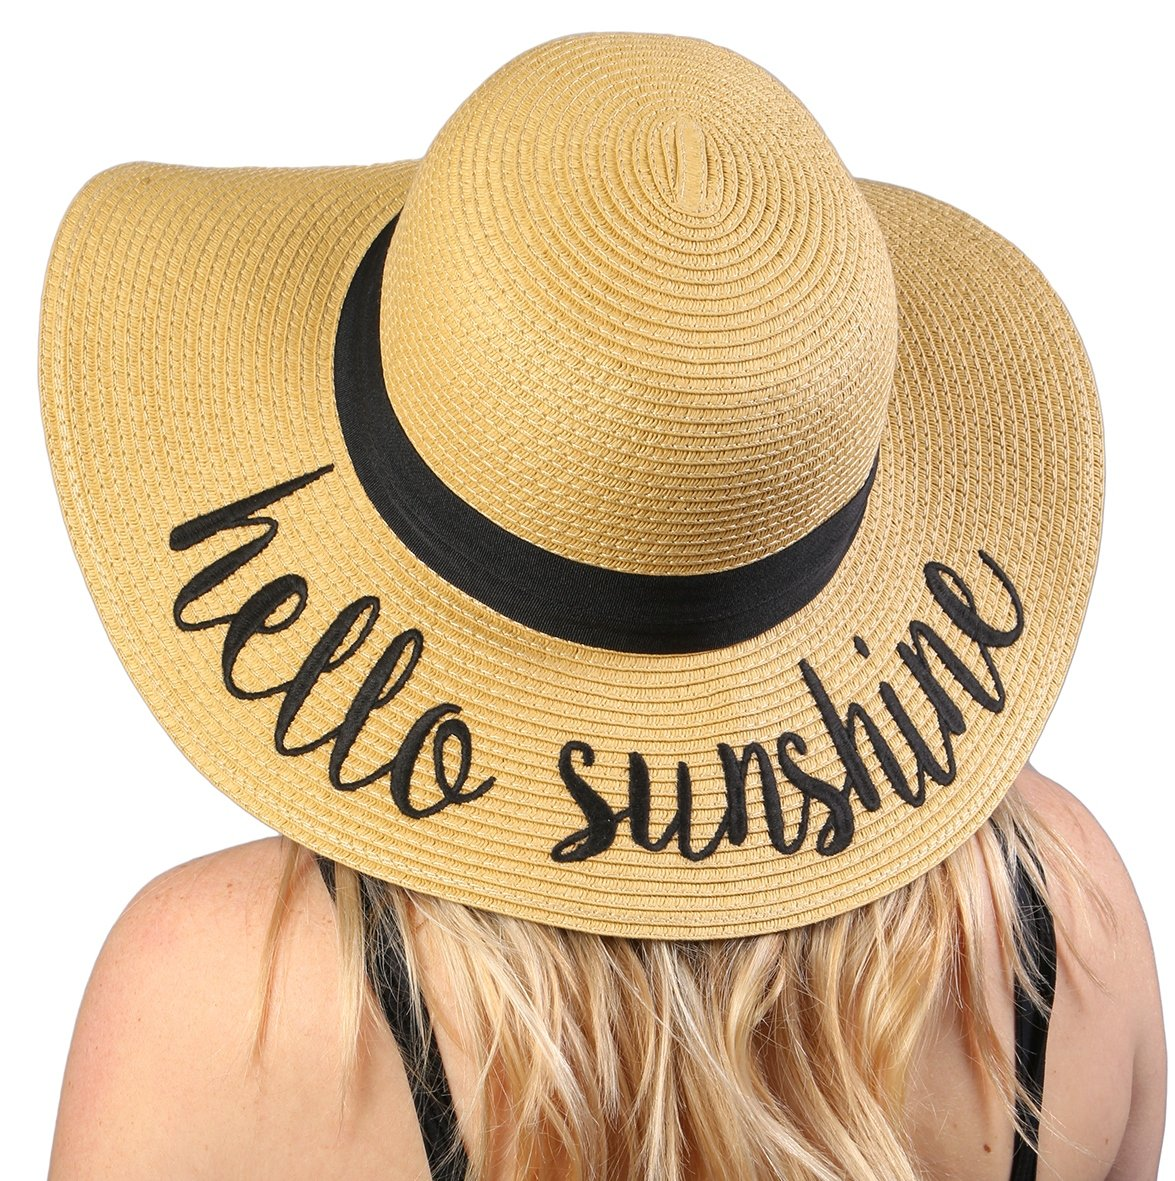 322e49e1e87 Funky Junque Women s Bold Cursive Embroidered Adjustable Beach Floppy Sun  Hat product image